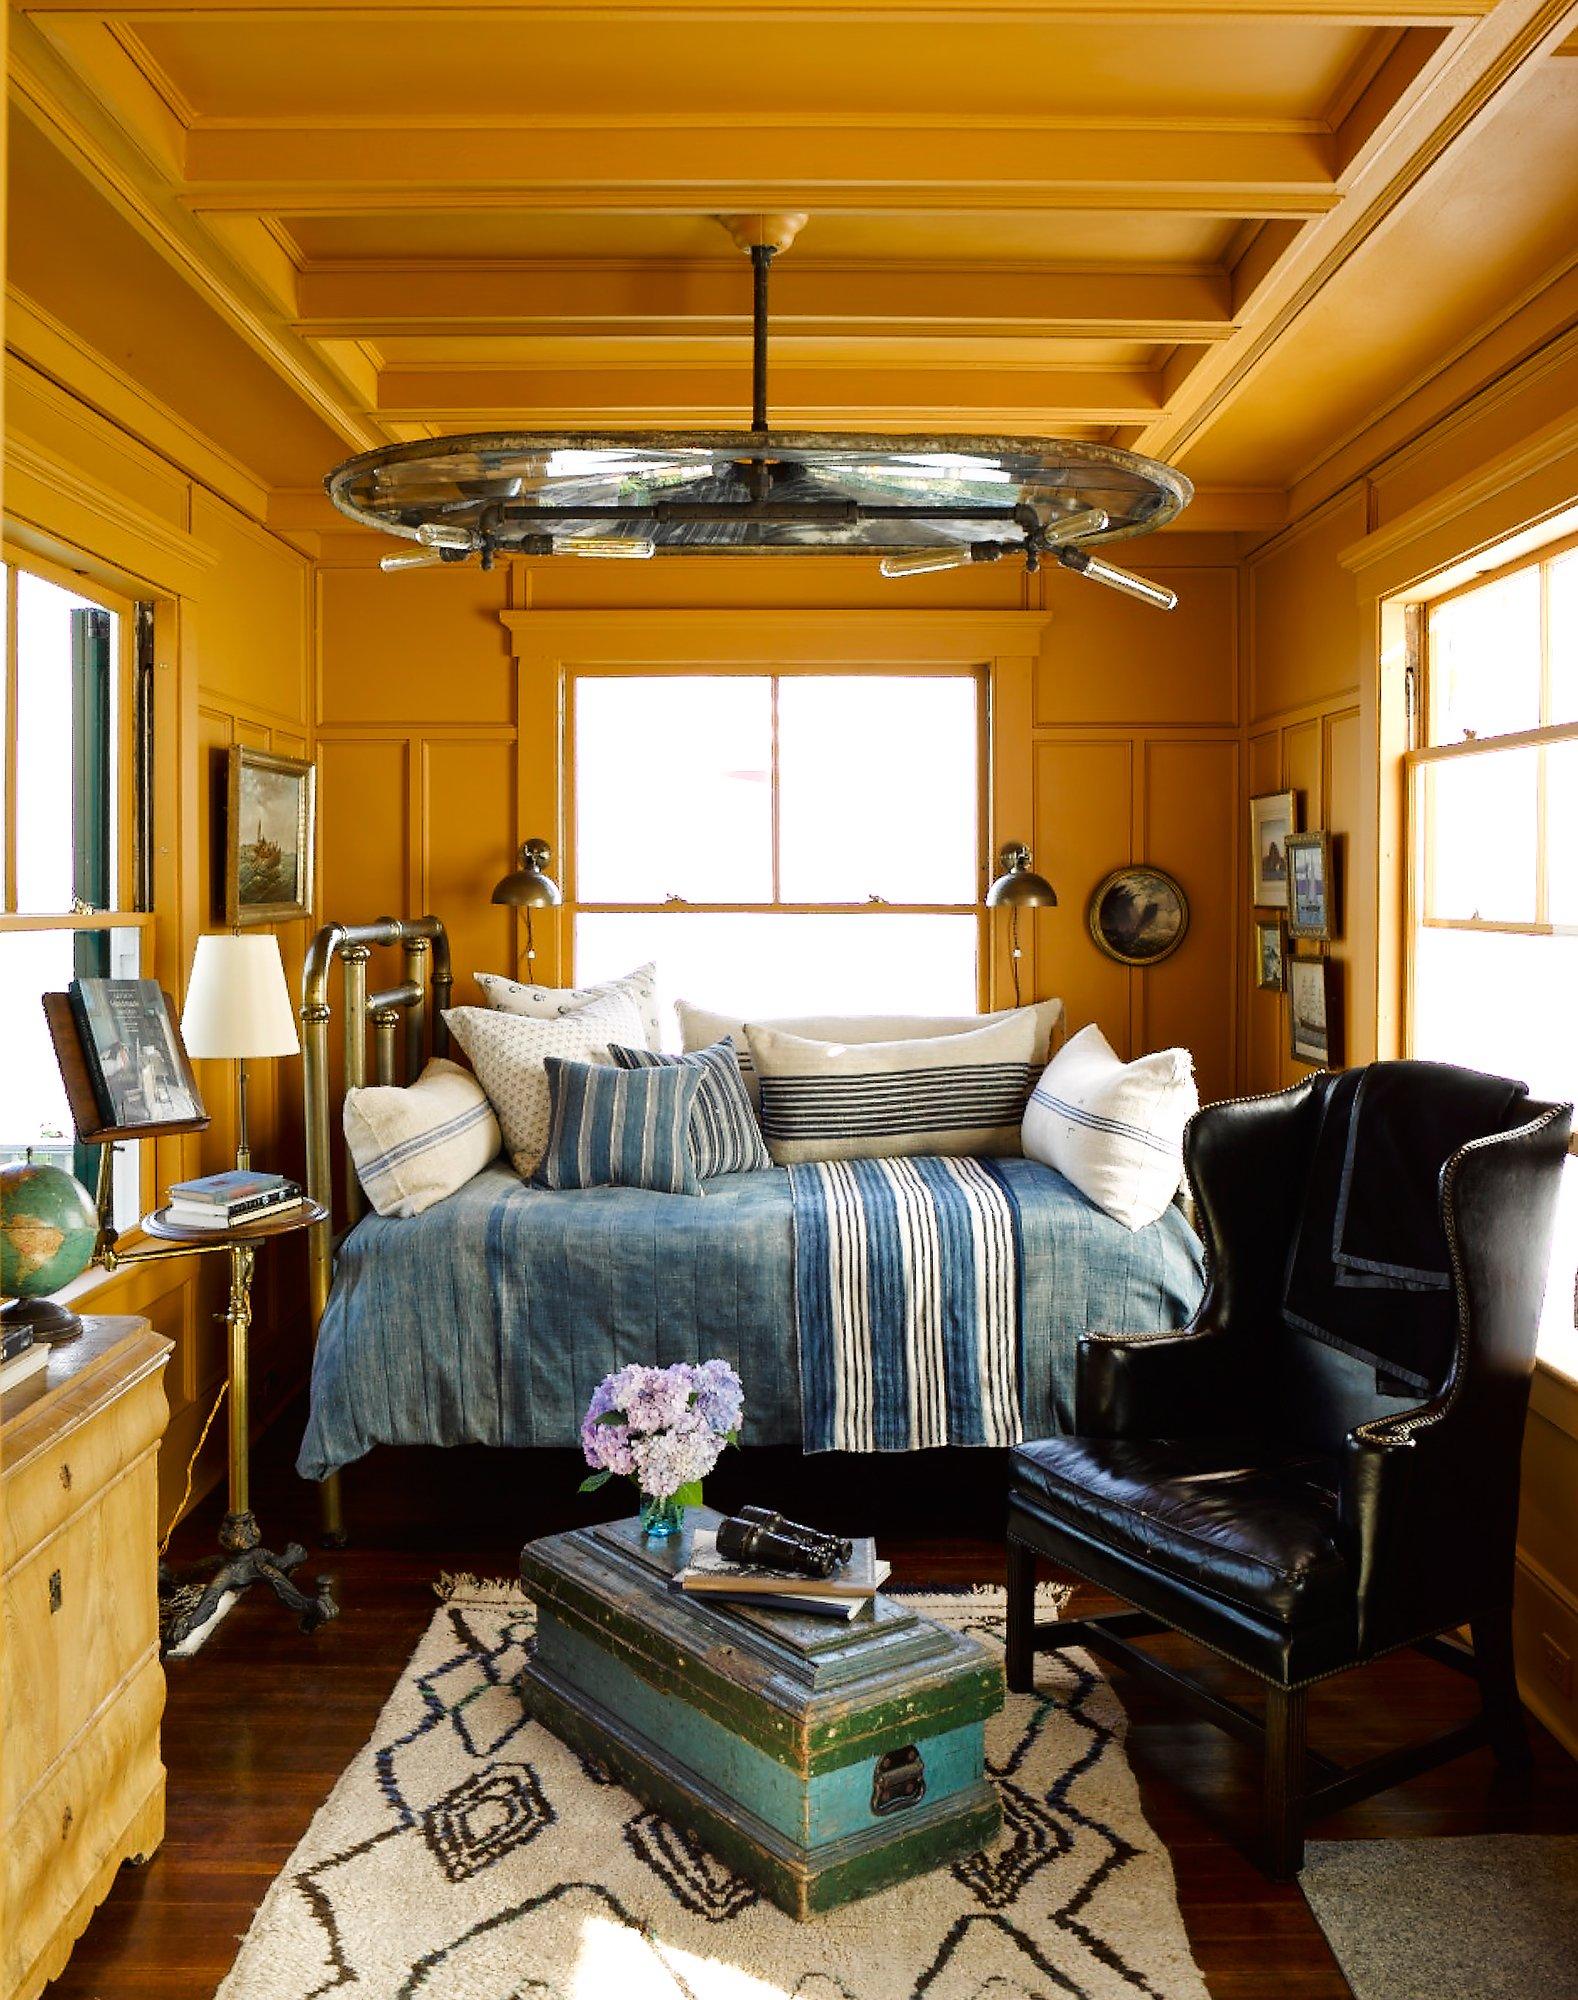 Dozens of inspiring ideas to decorate your living room, from countryliving.com. 8 Inspiring Small Rooms and Their Design Secrets - Vogue